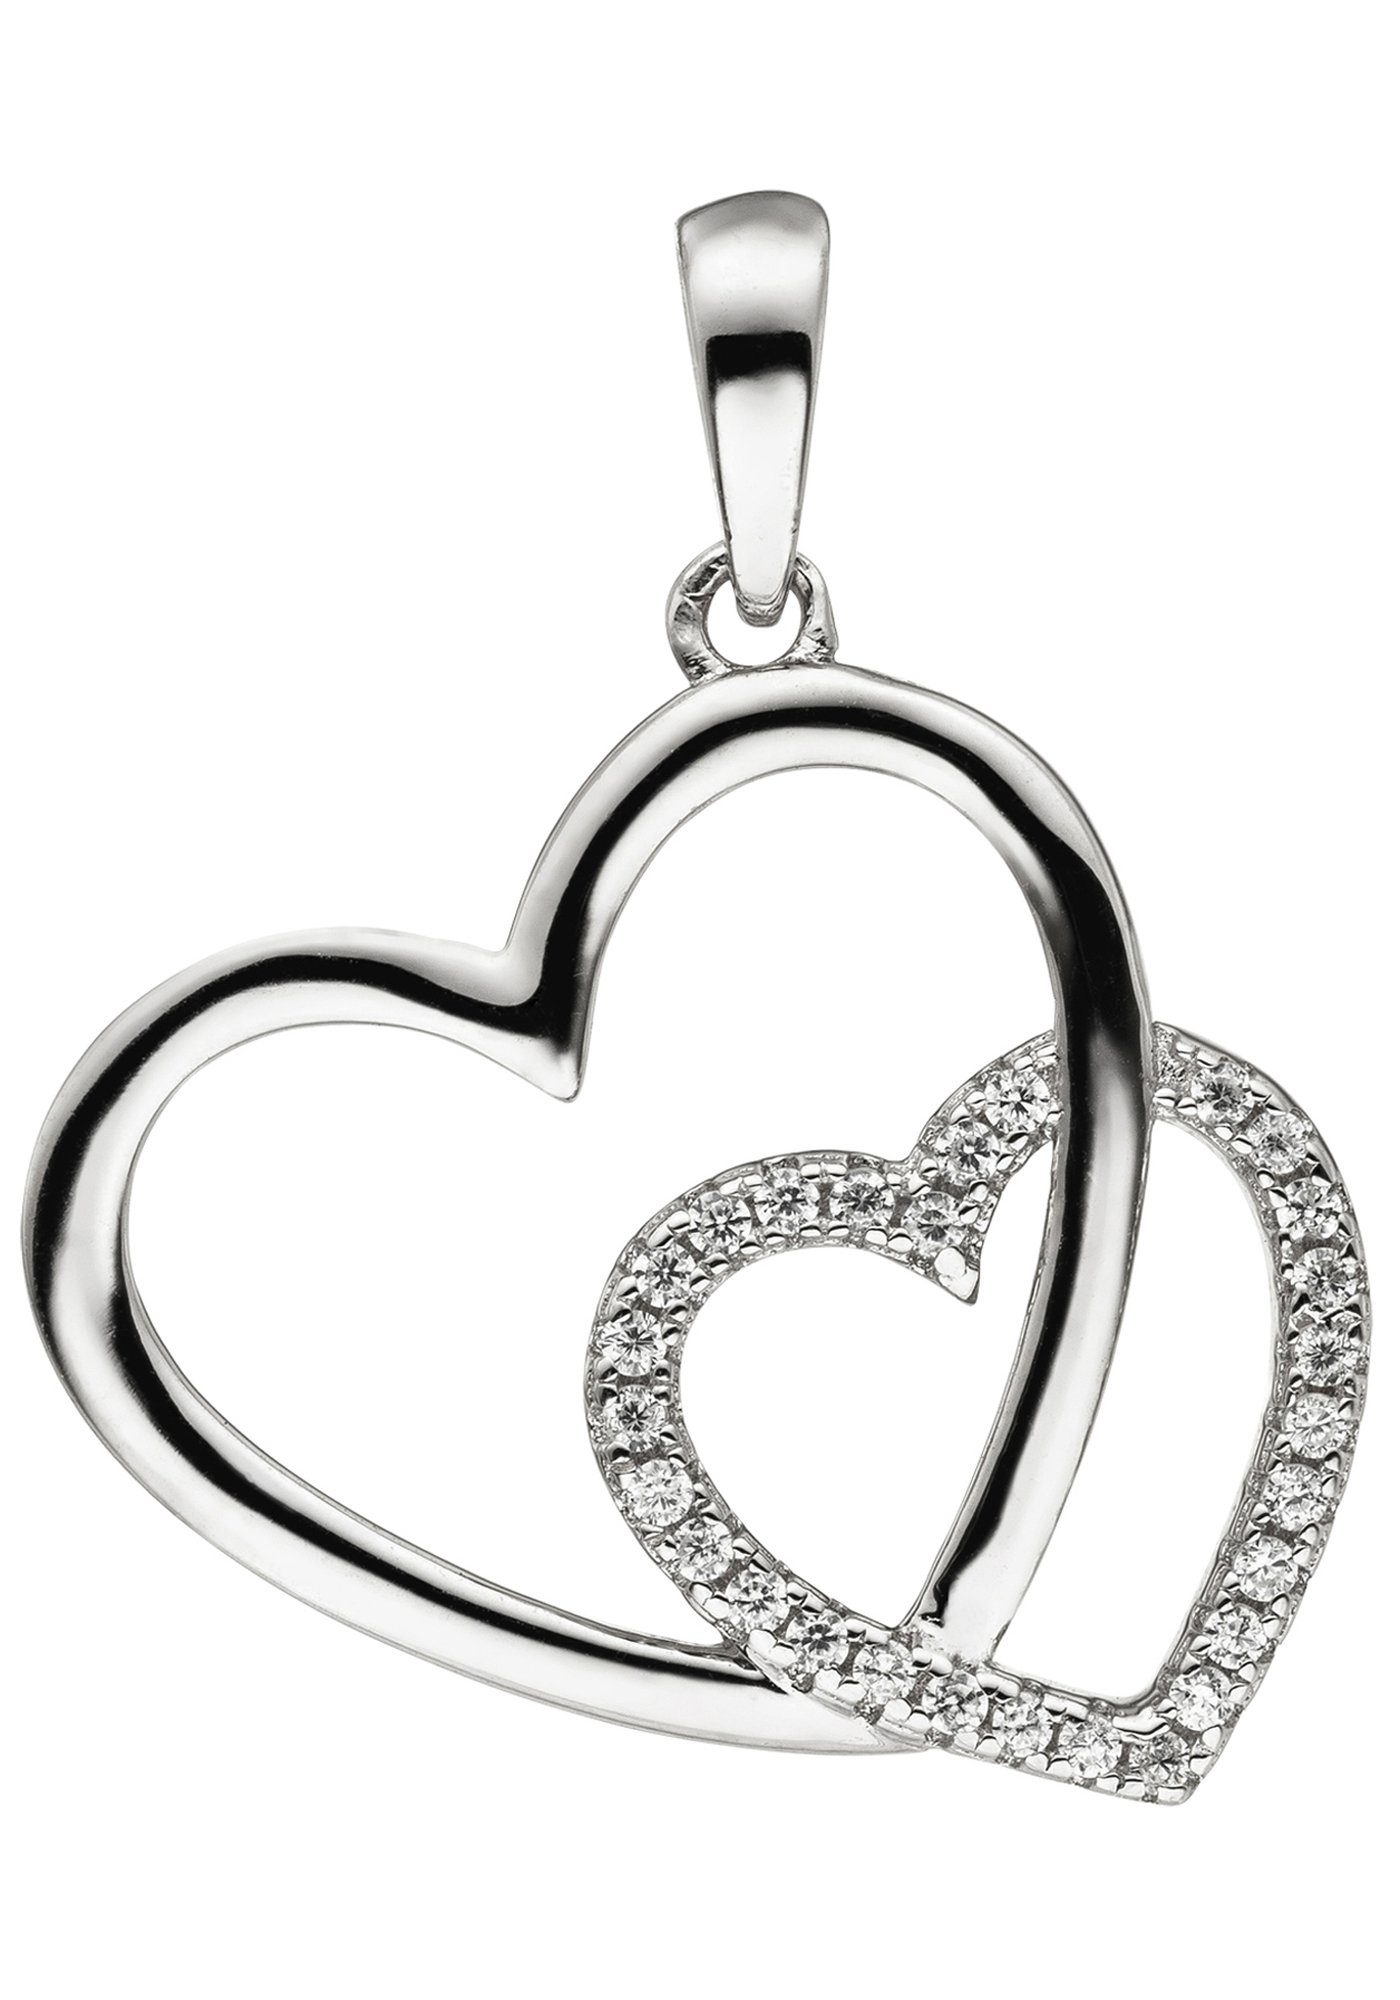 JOBO Herzanhänger »Herz Herzen« 925 Silber mit 28 Zirkonia